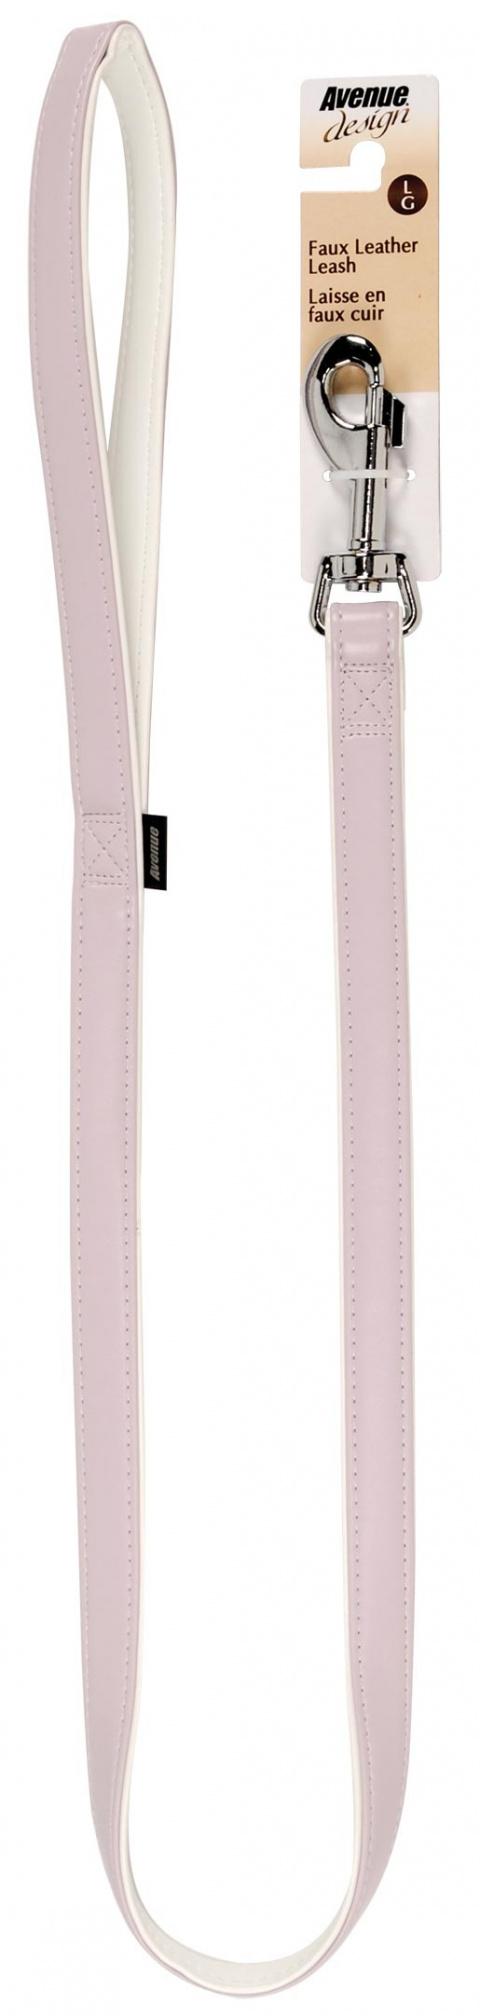 Vodidlo AVENUE Elegance ružové 100x2cm